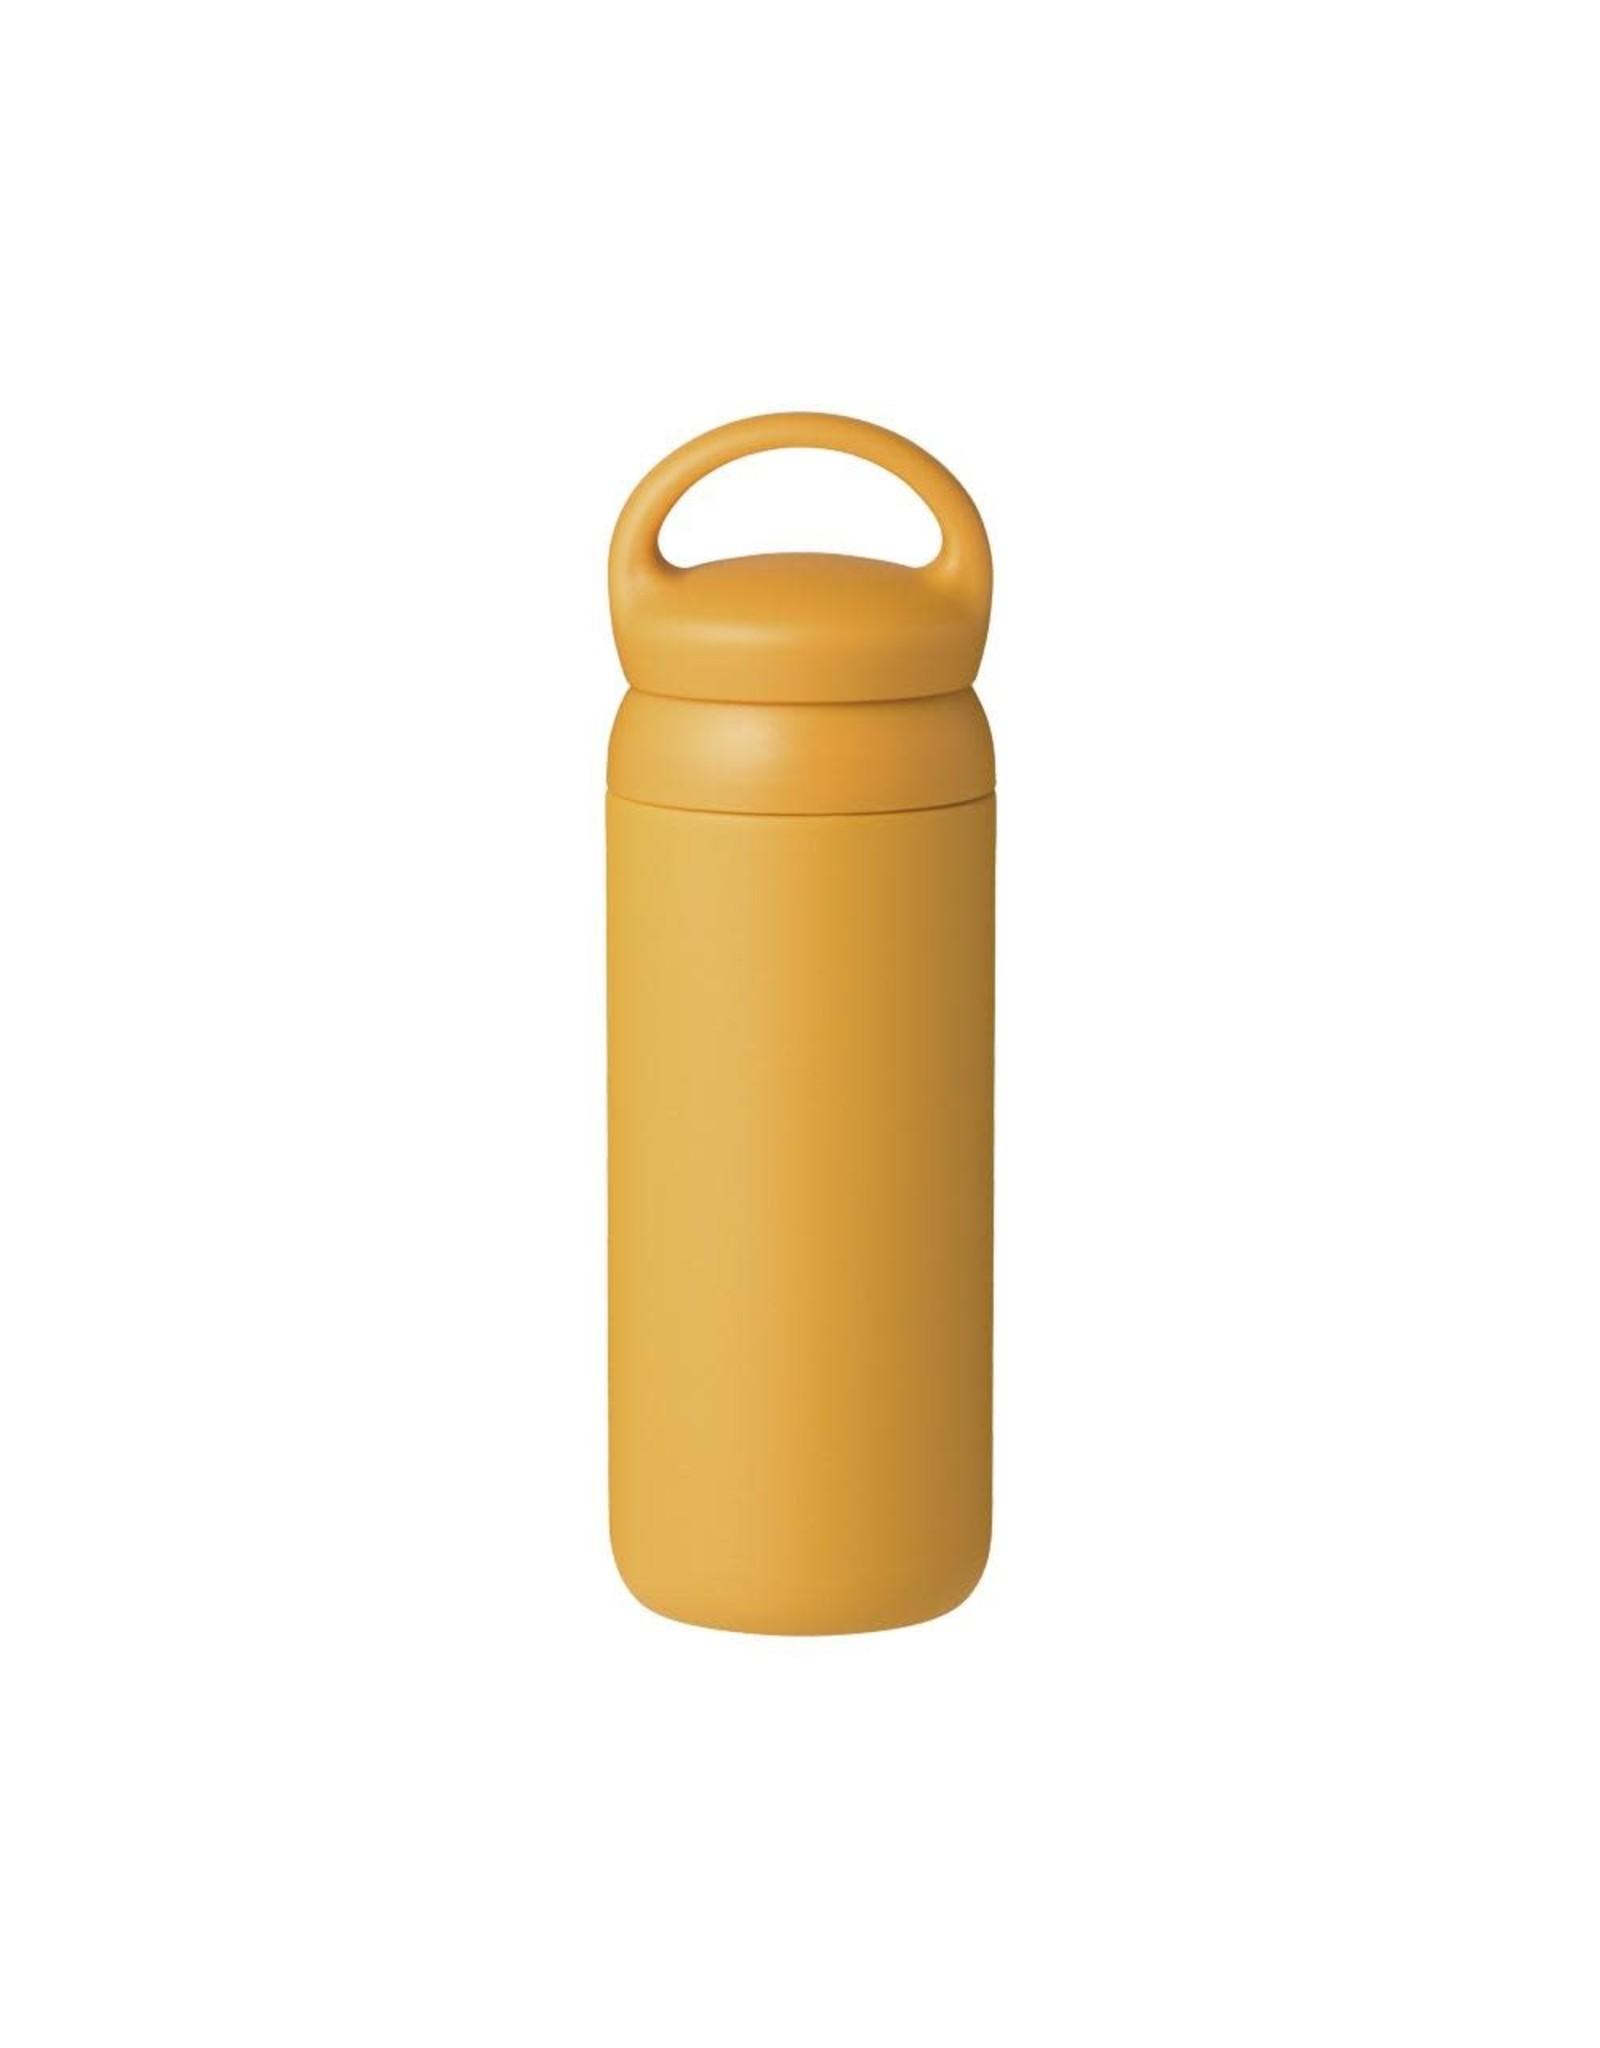 Kinto Day Off Tumbler, Mustard